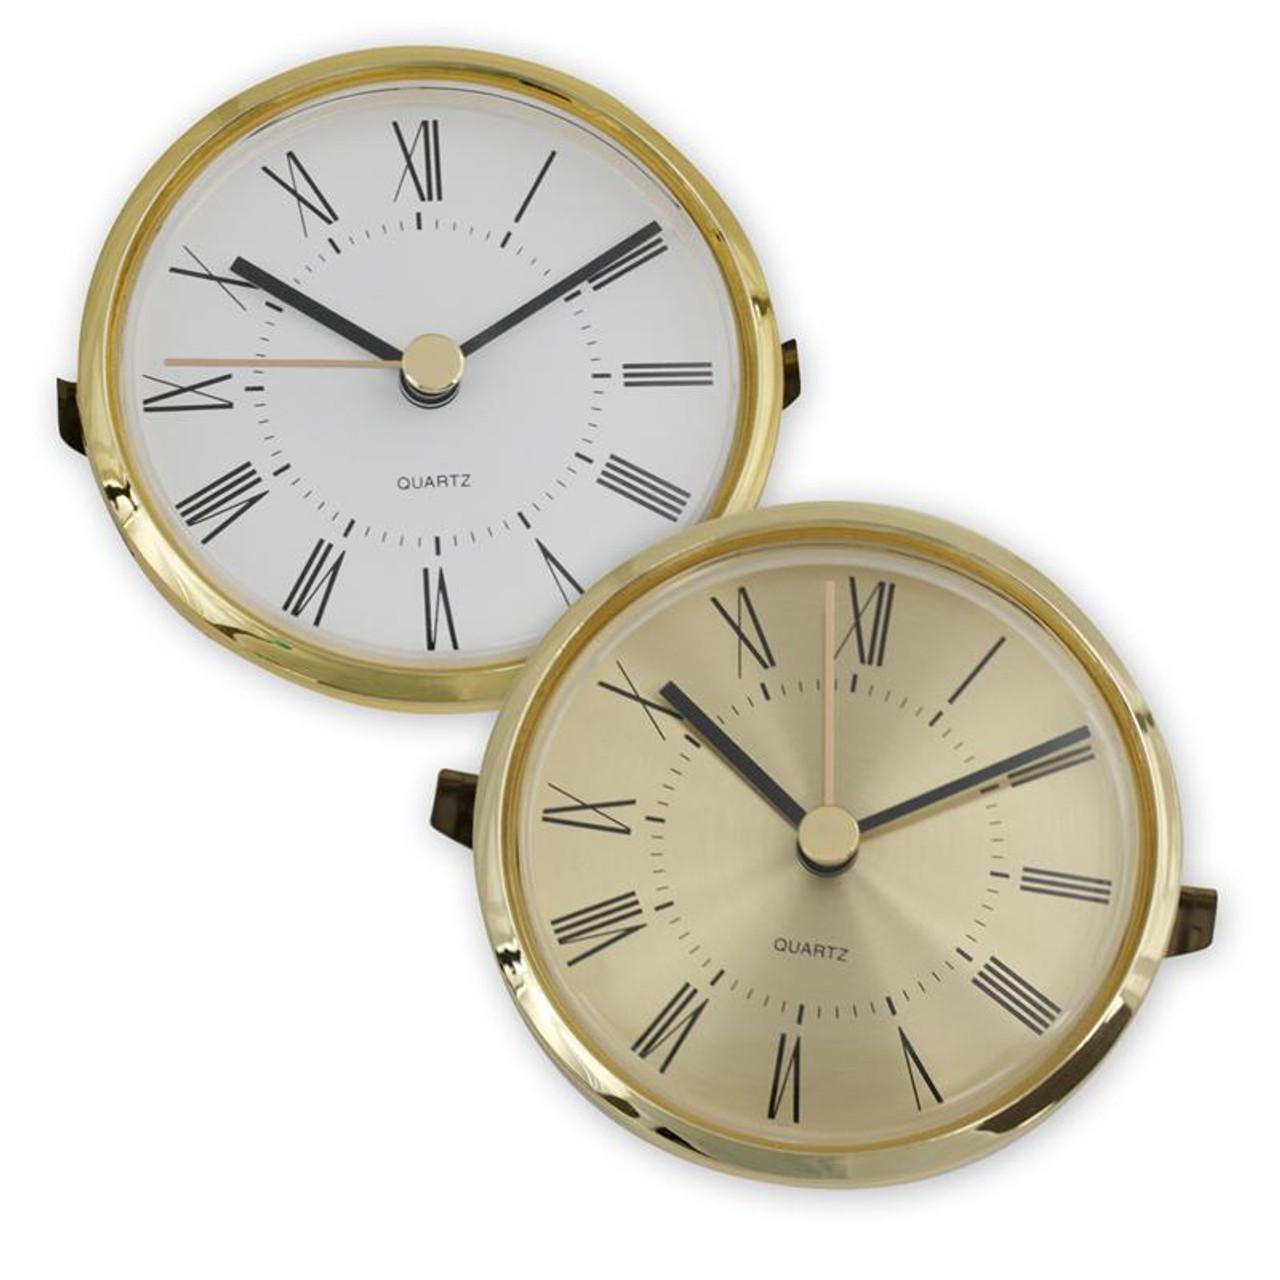 Roman Numeral Gold Bezel Clock Movement Insert - 3-roman-numerals-clocks